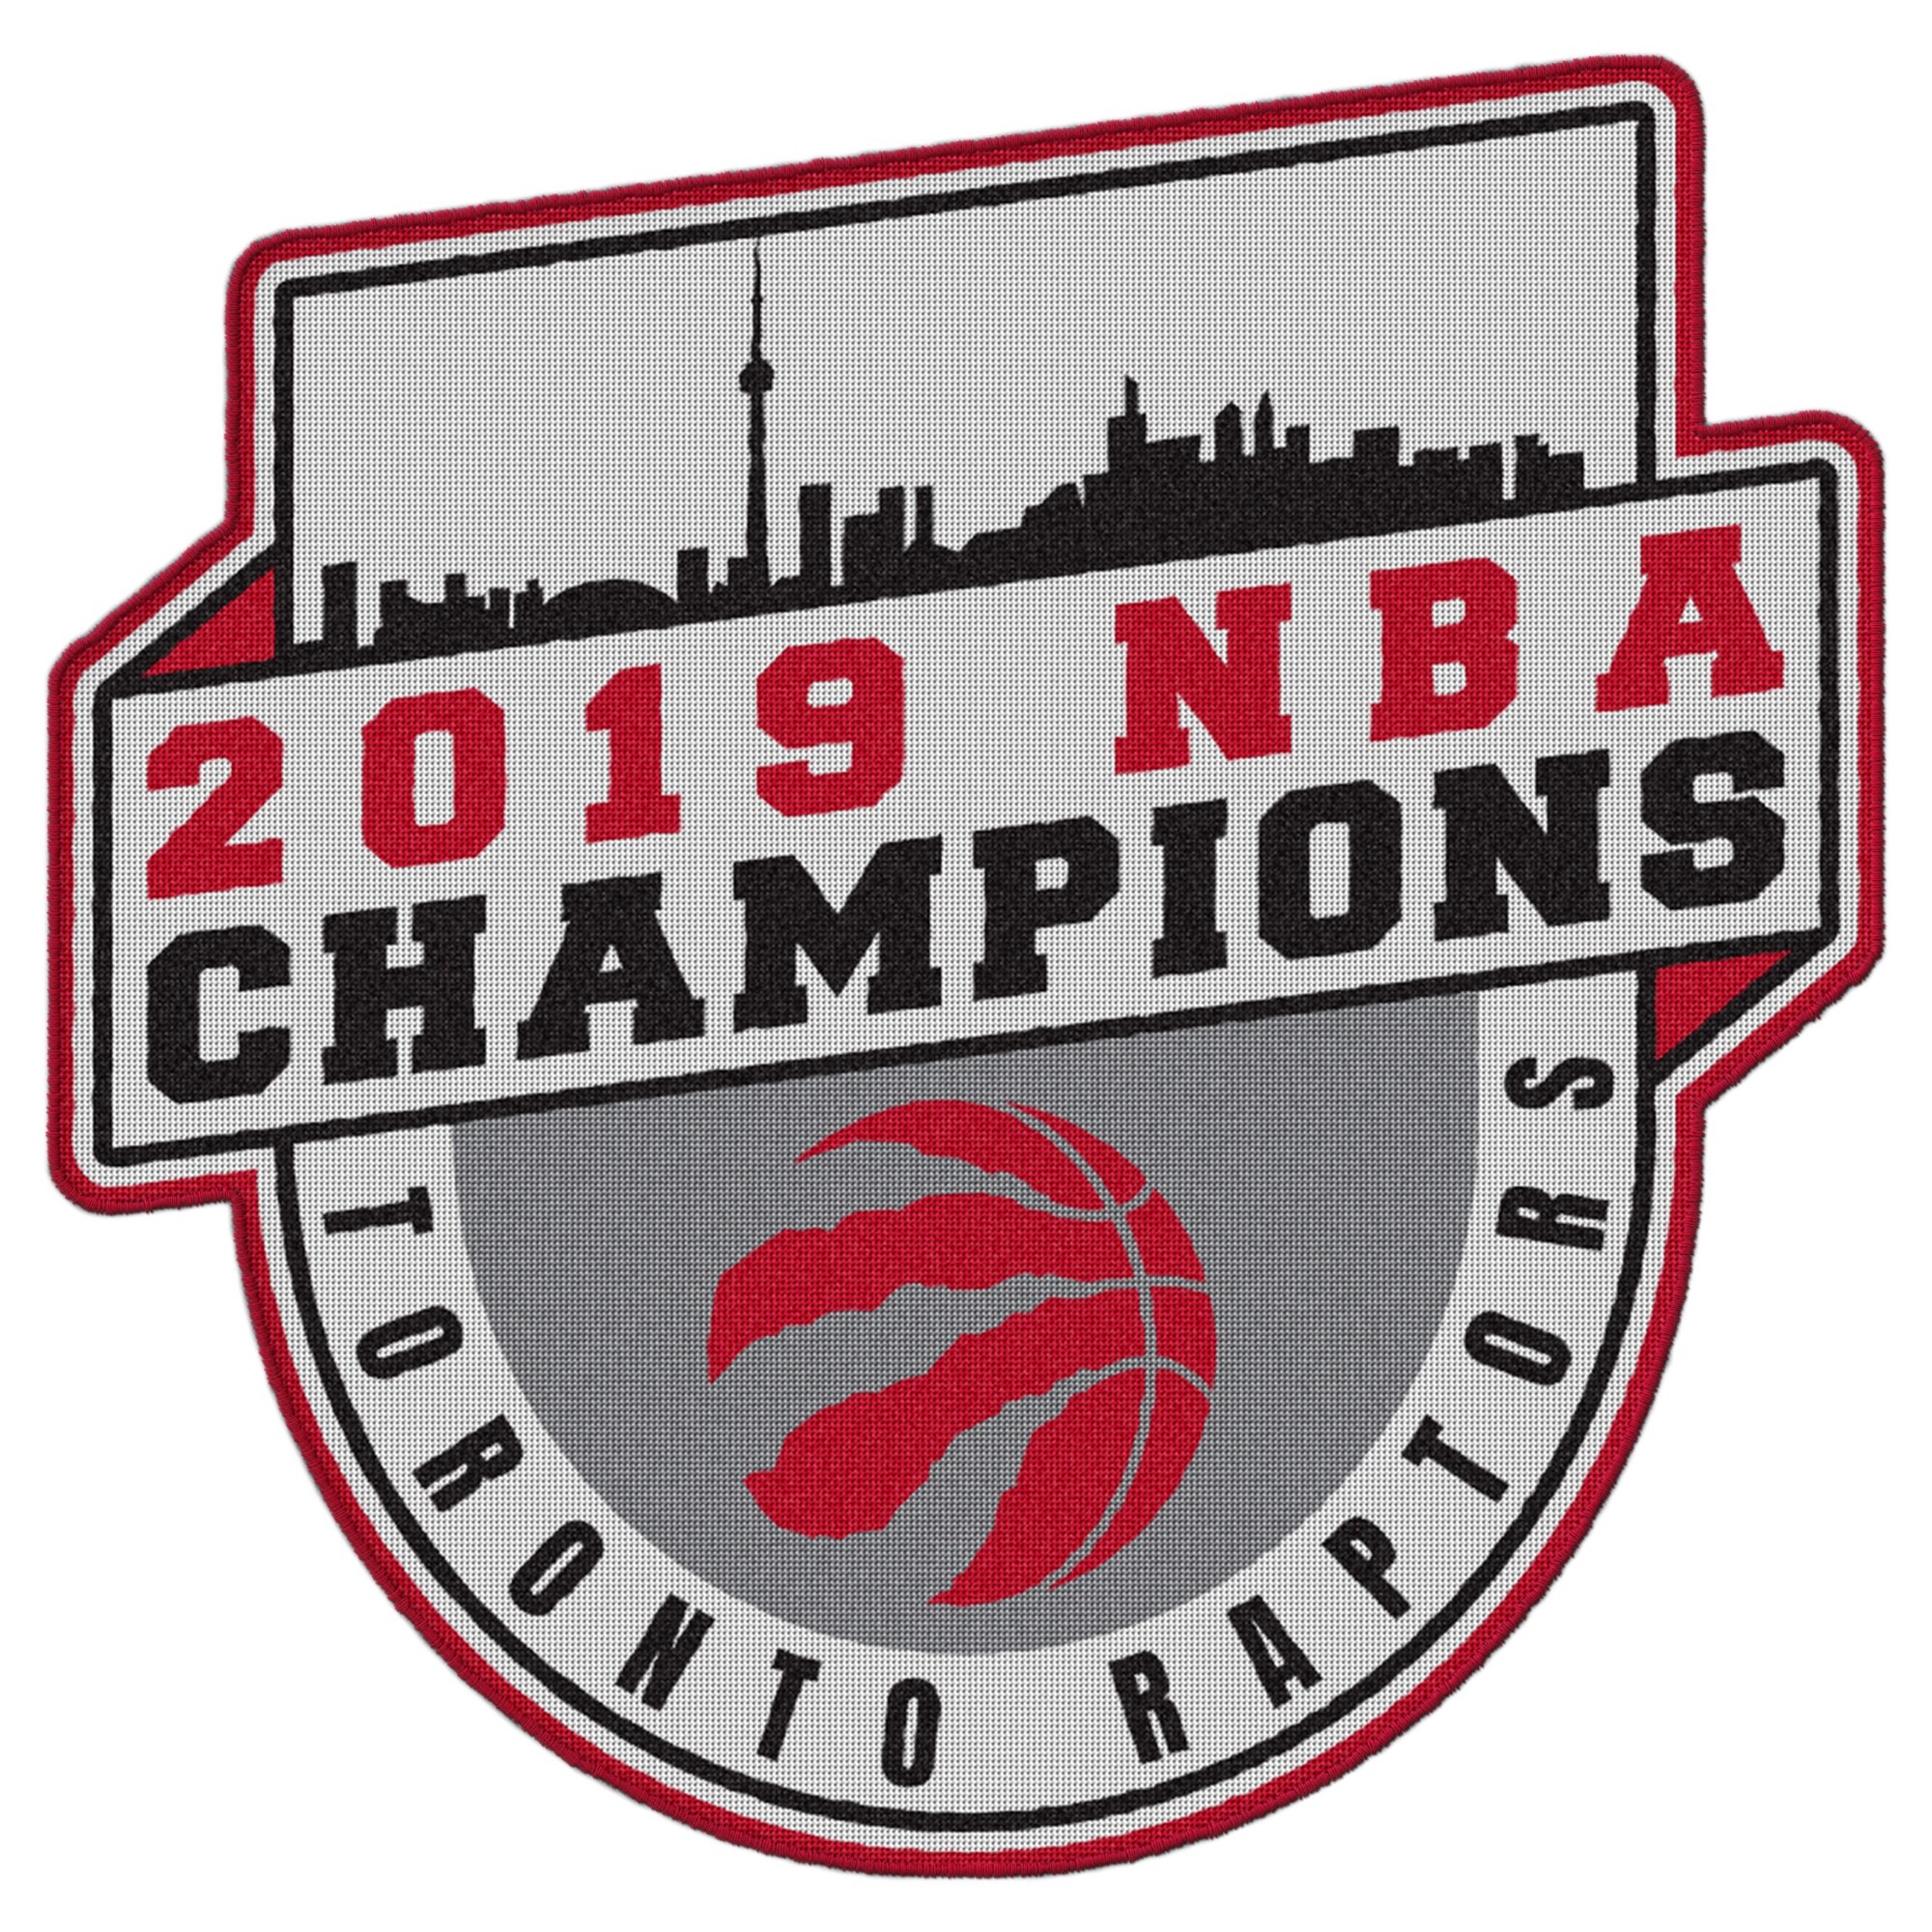 Toronto Raptors 2019 NBA Finals Champions Run the Table Patch